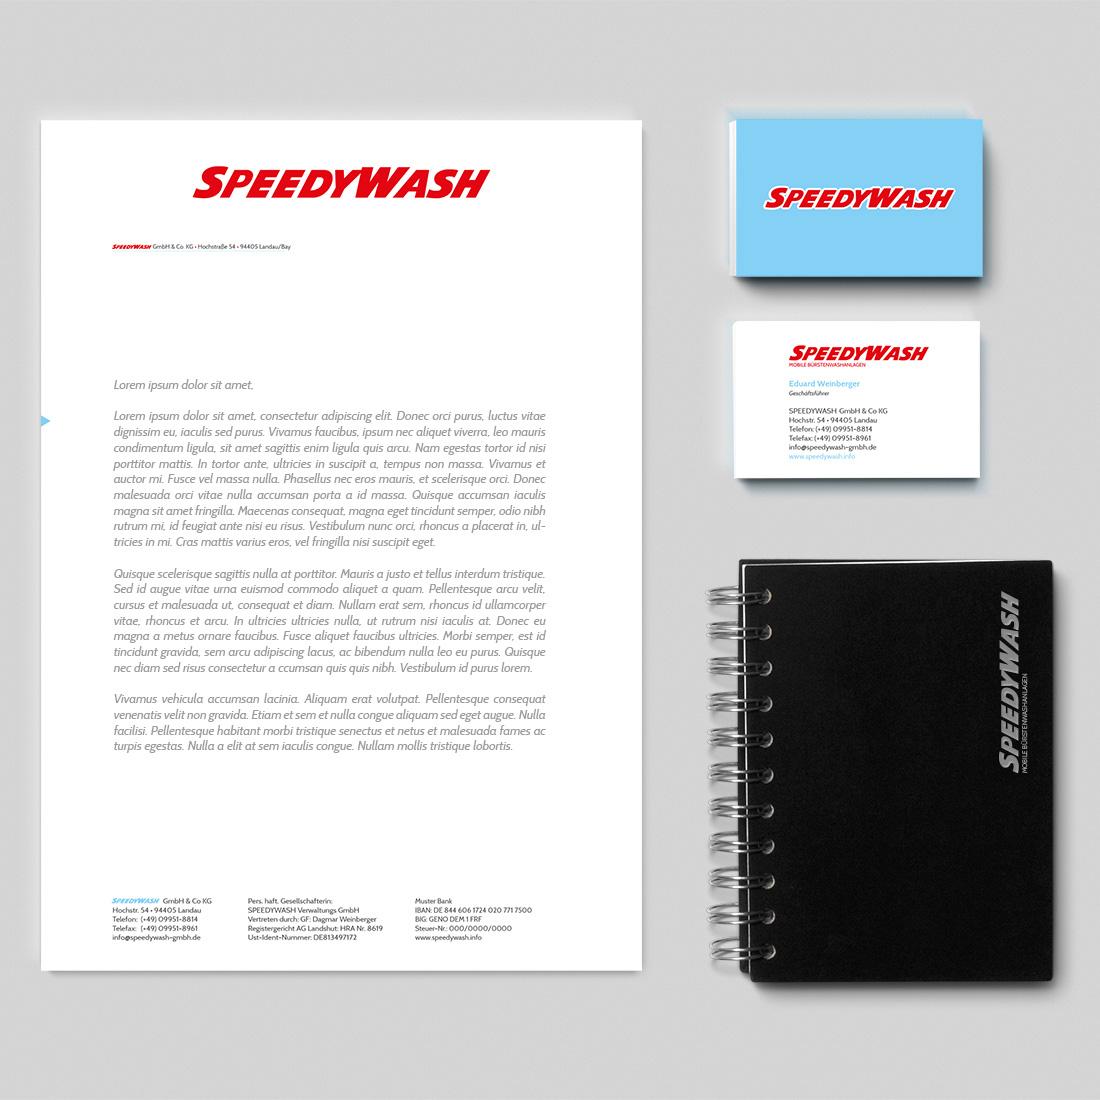 Speedwash Branding